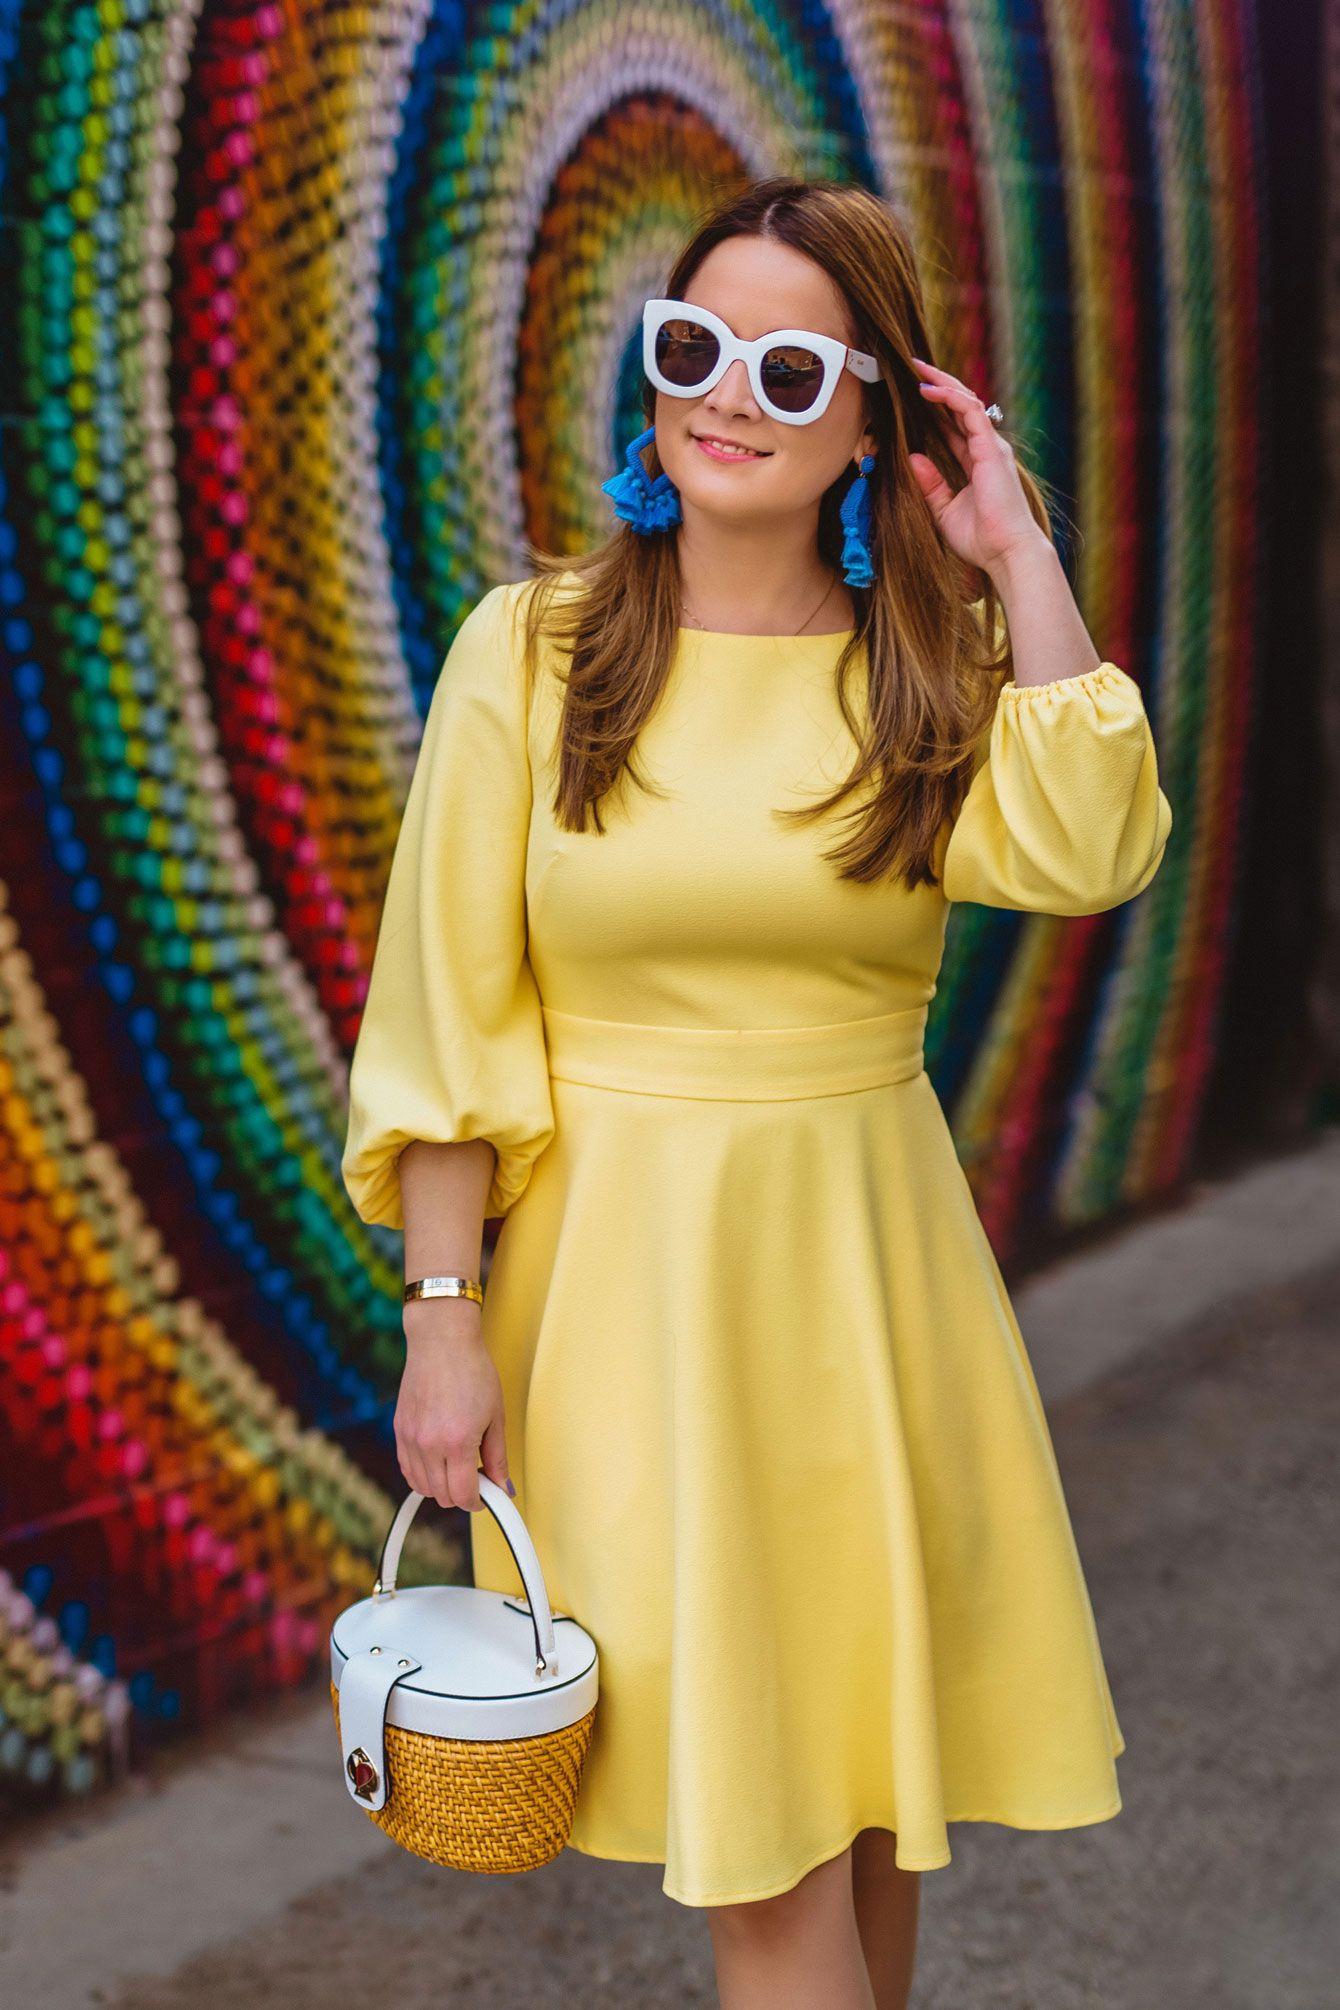 edc99ced3a59 Bauble Bar Blue Tassel Statement Earrings yellow fit and flare lantern sleeve  dress Jenn Lake of